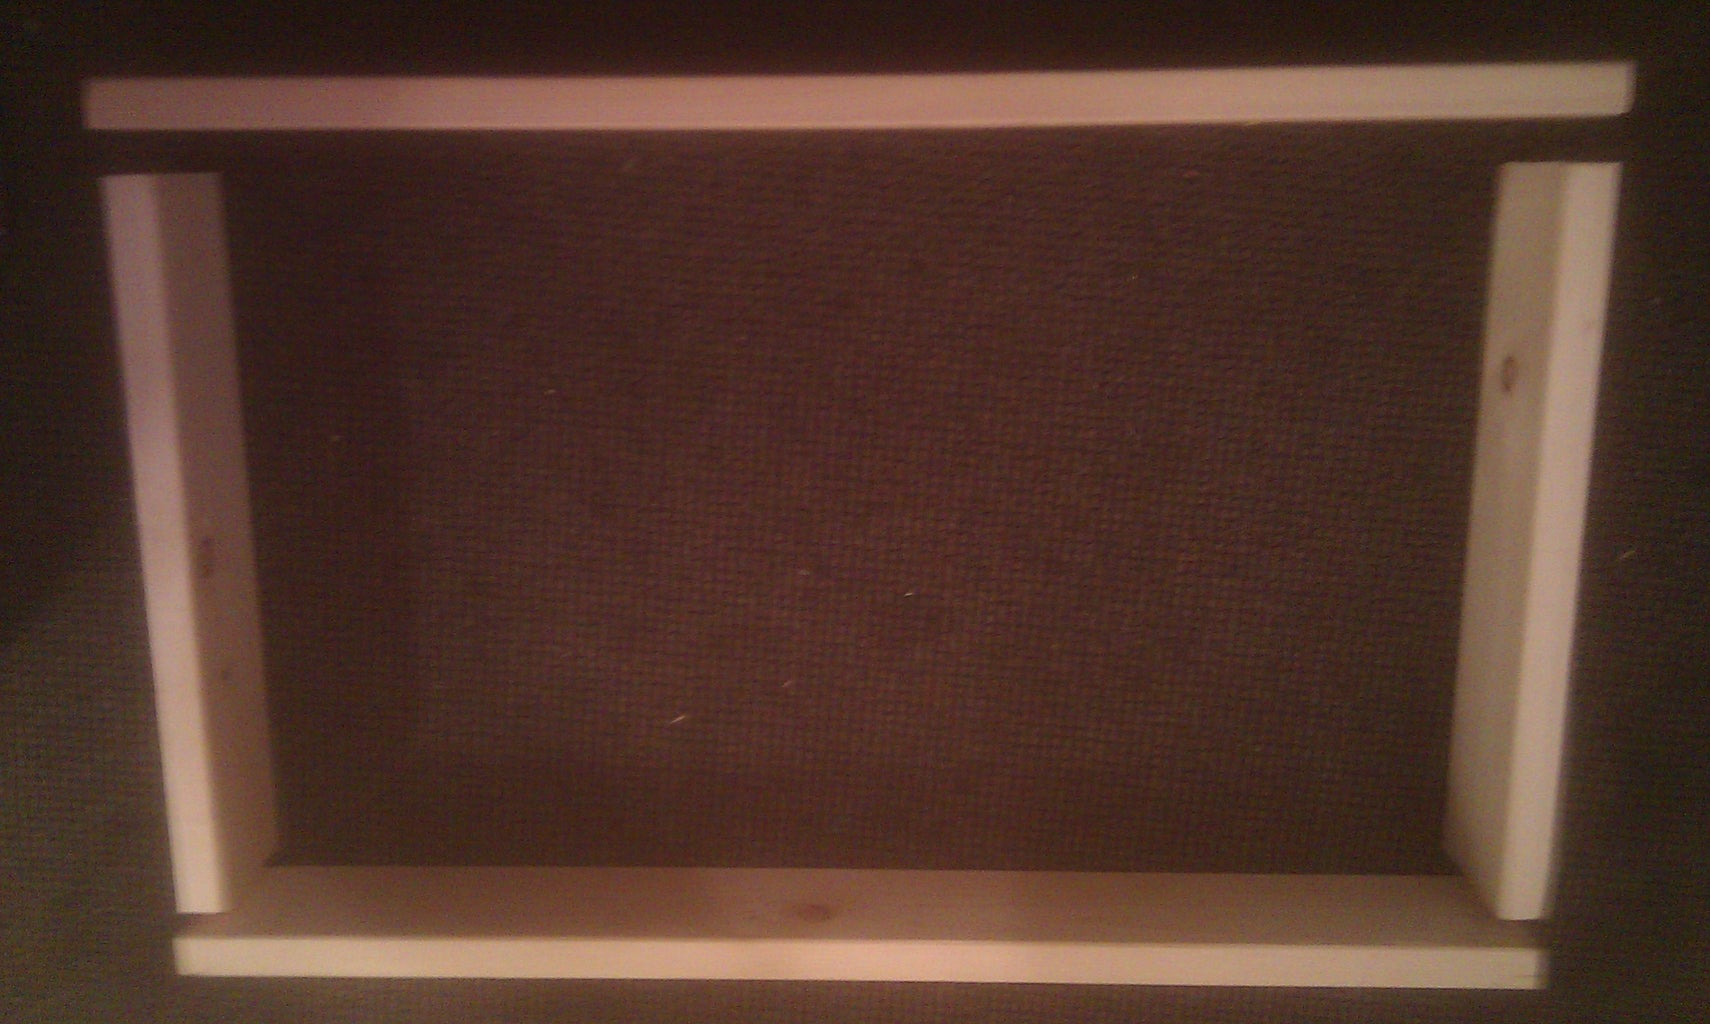 Assemble Frame (A & B)